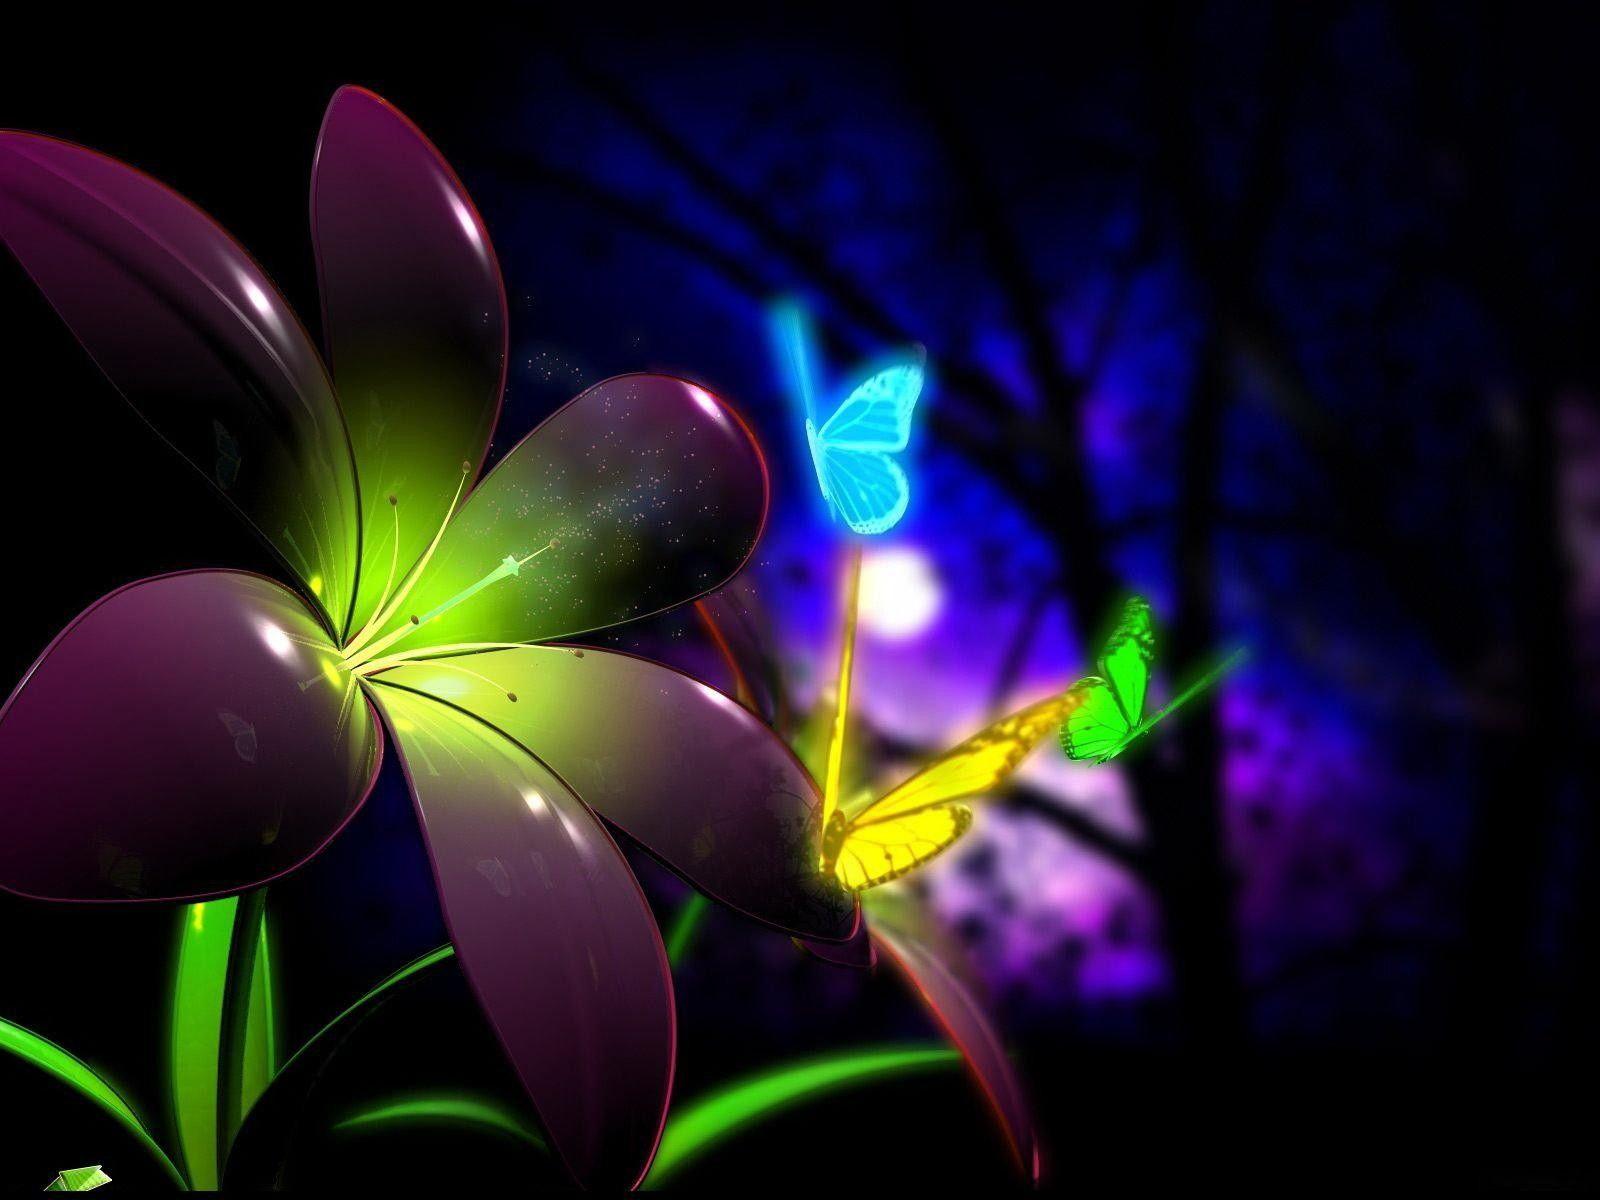 3d Fluor Wallpaper Google Zoeken 3d Wallpaper Of Flowers Background Hd Wallpaper Wallpaper Free Download